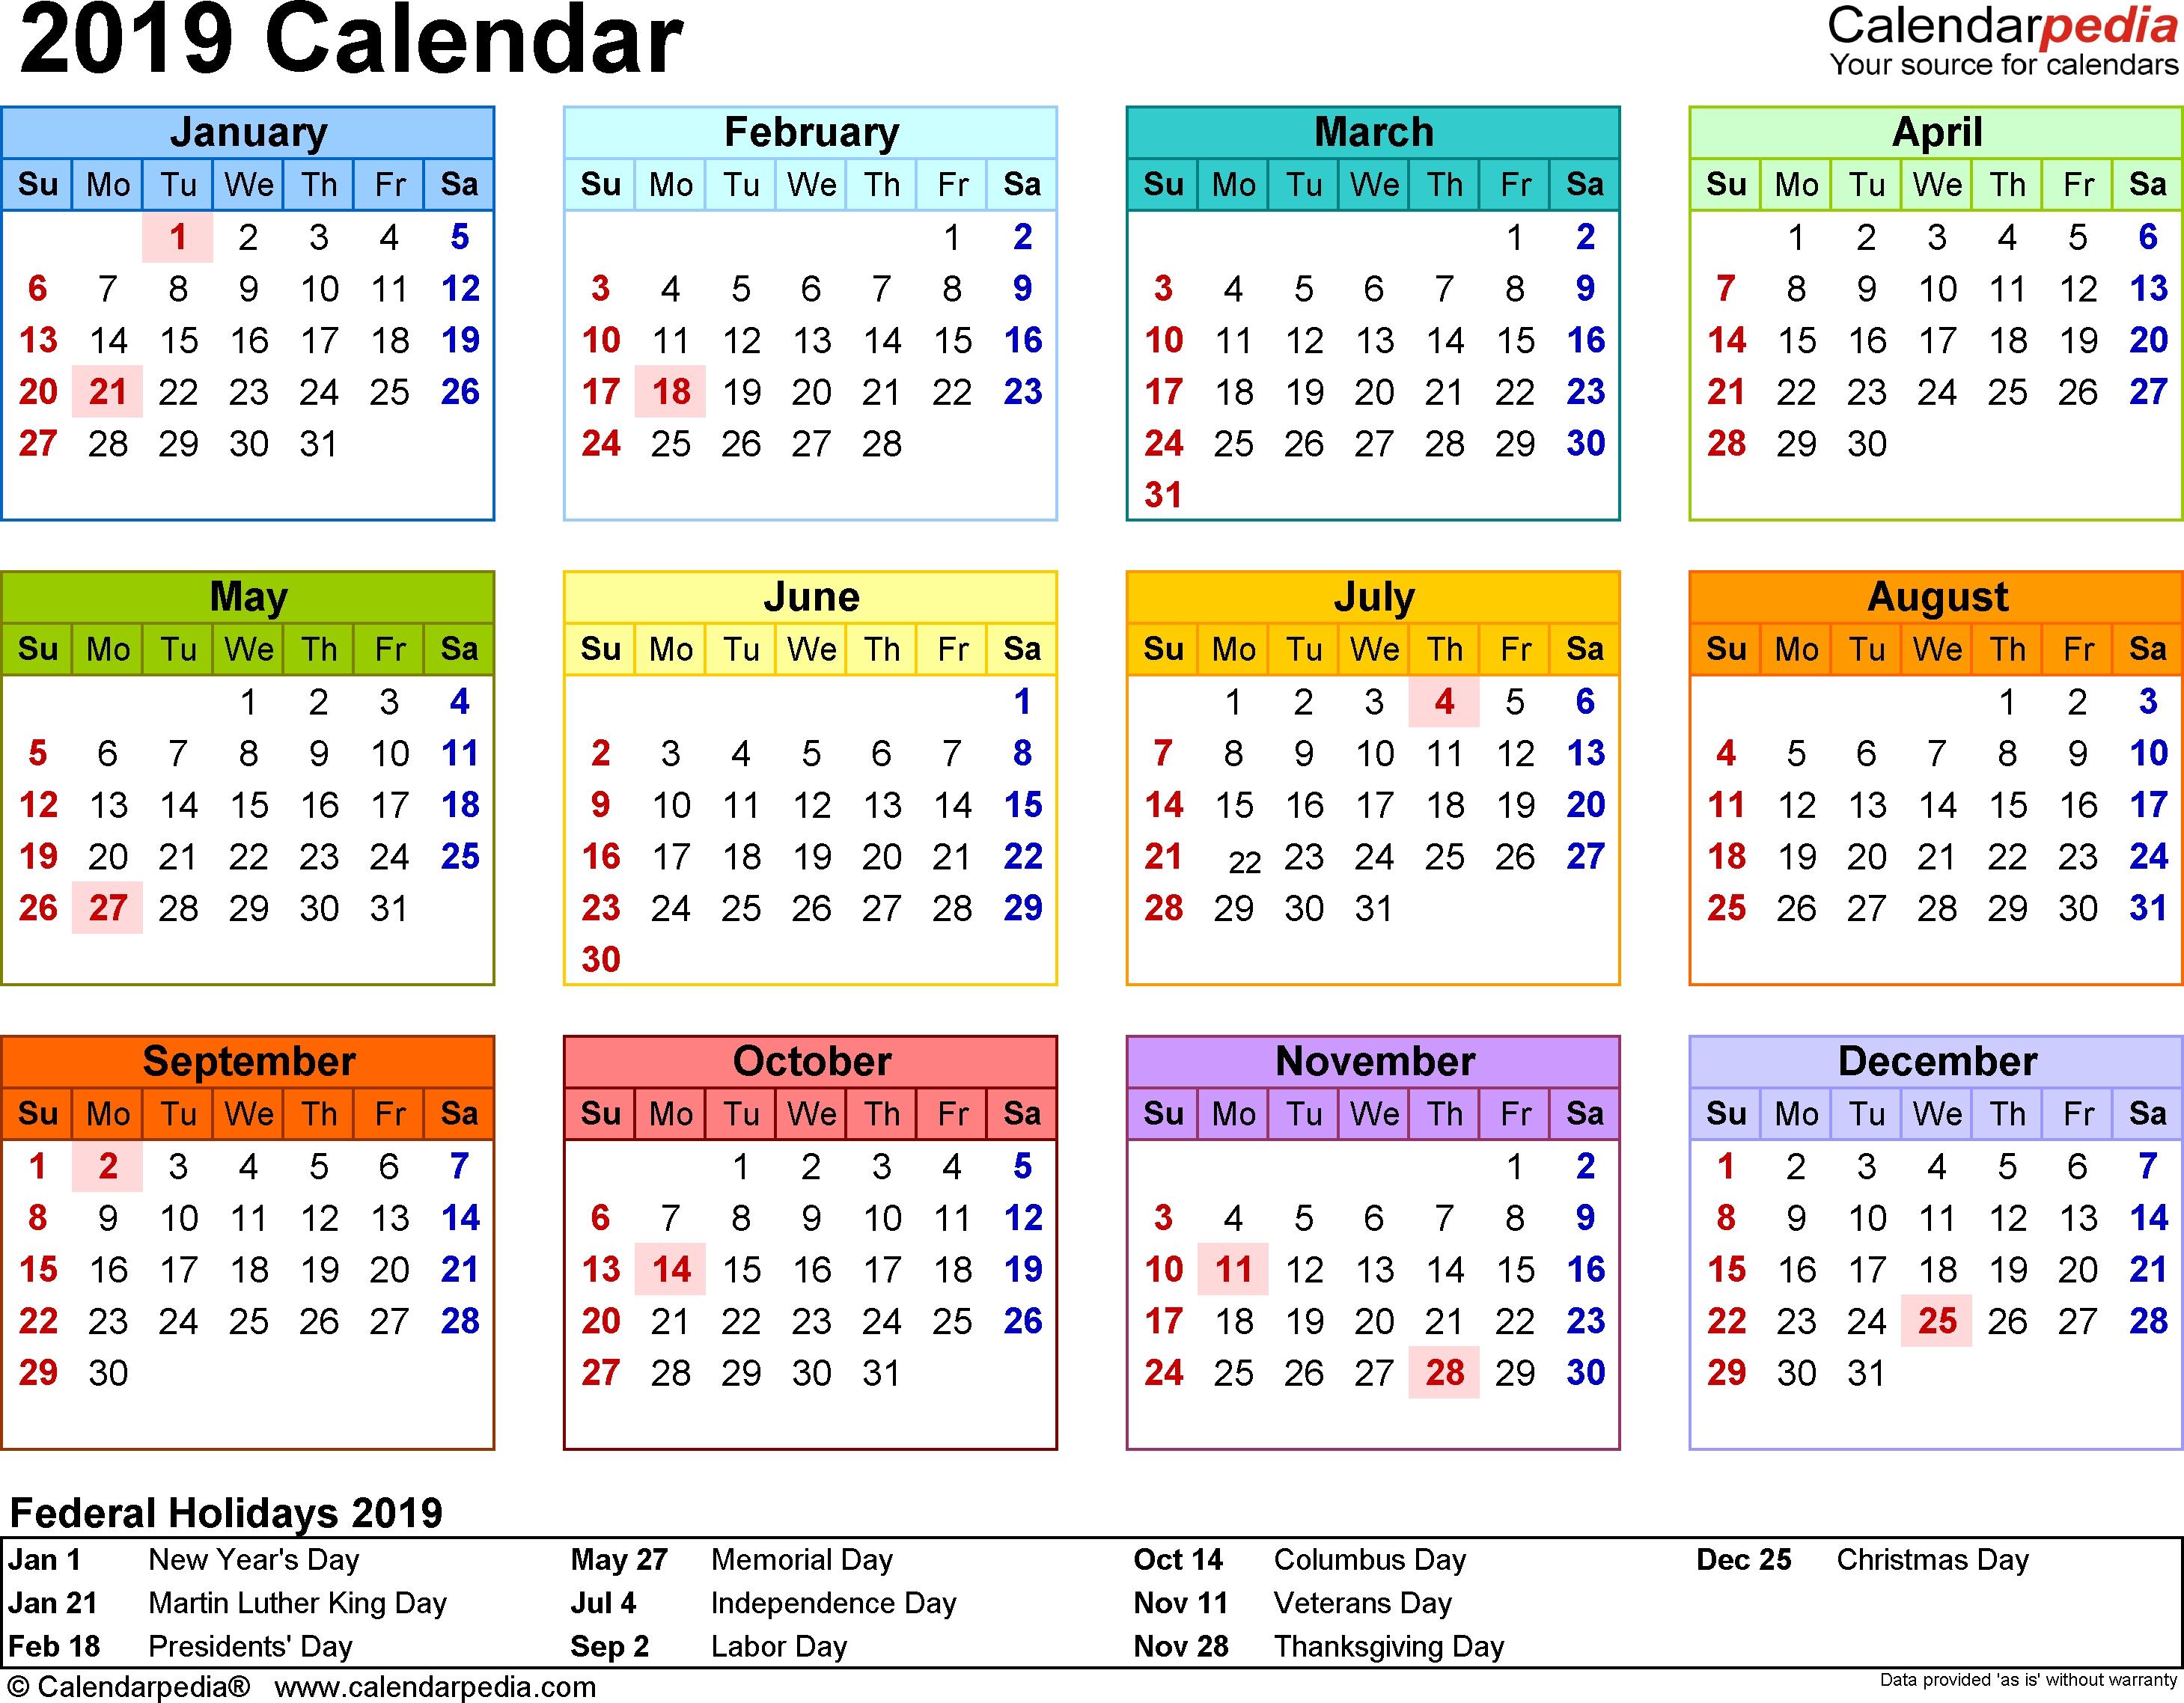 2019 Calendar Pdf - 17 Free Printable Calendar Templates within Free Printable Calendar Year At A Glance Calendar